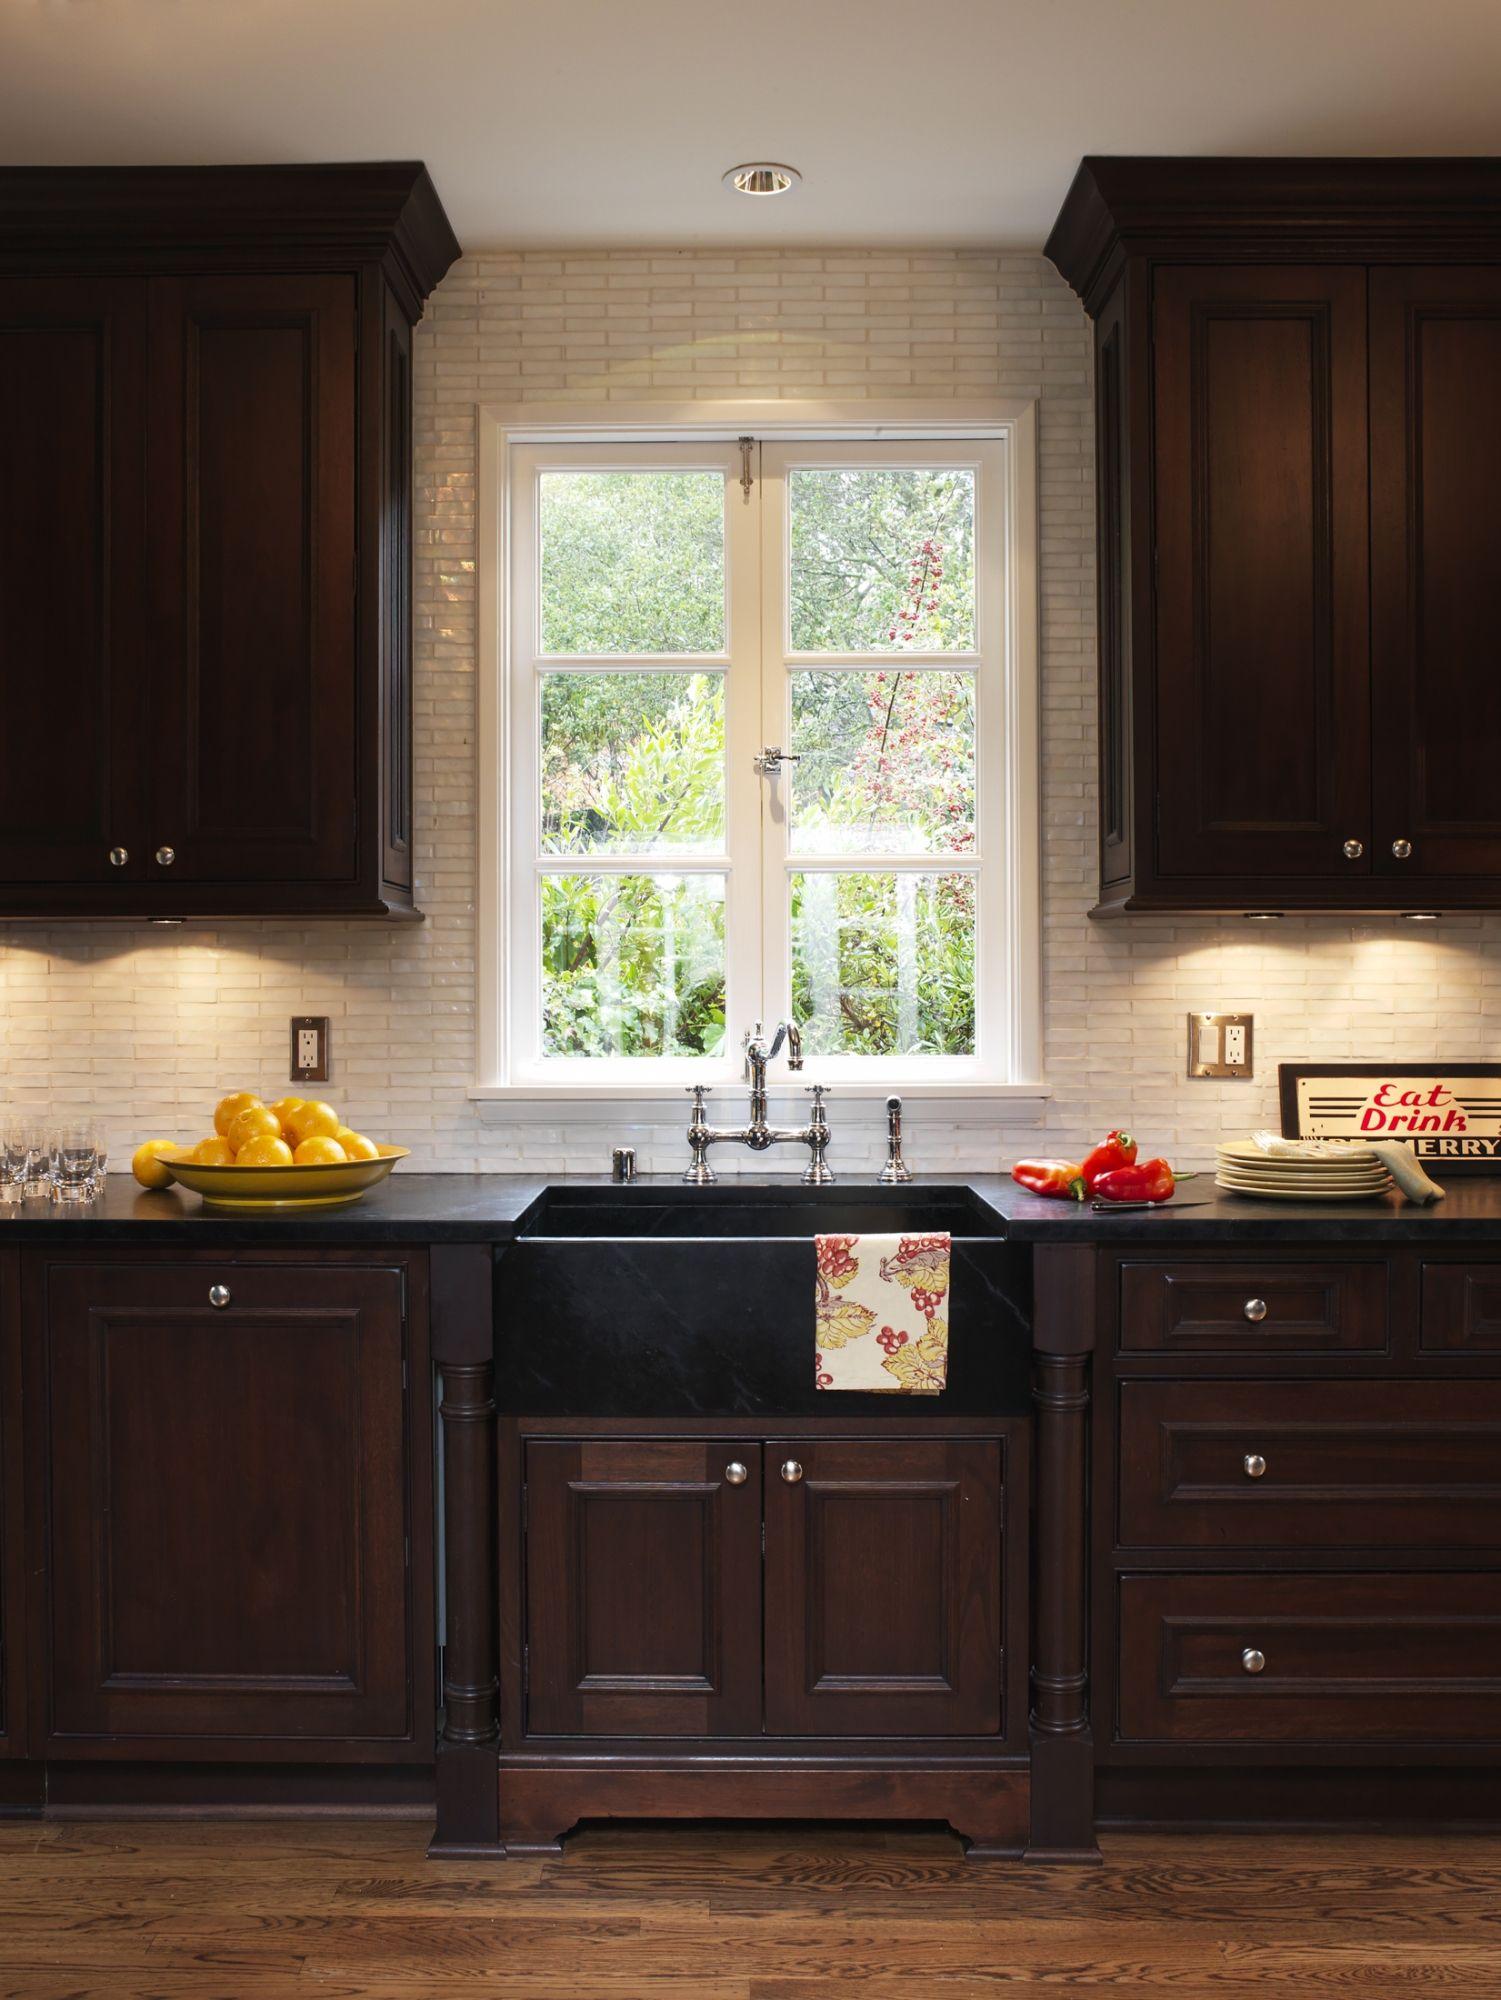 Soapstone countertop with apron sink in ebony Love the dark